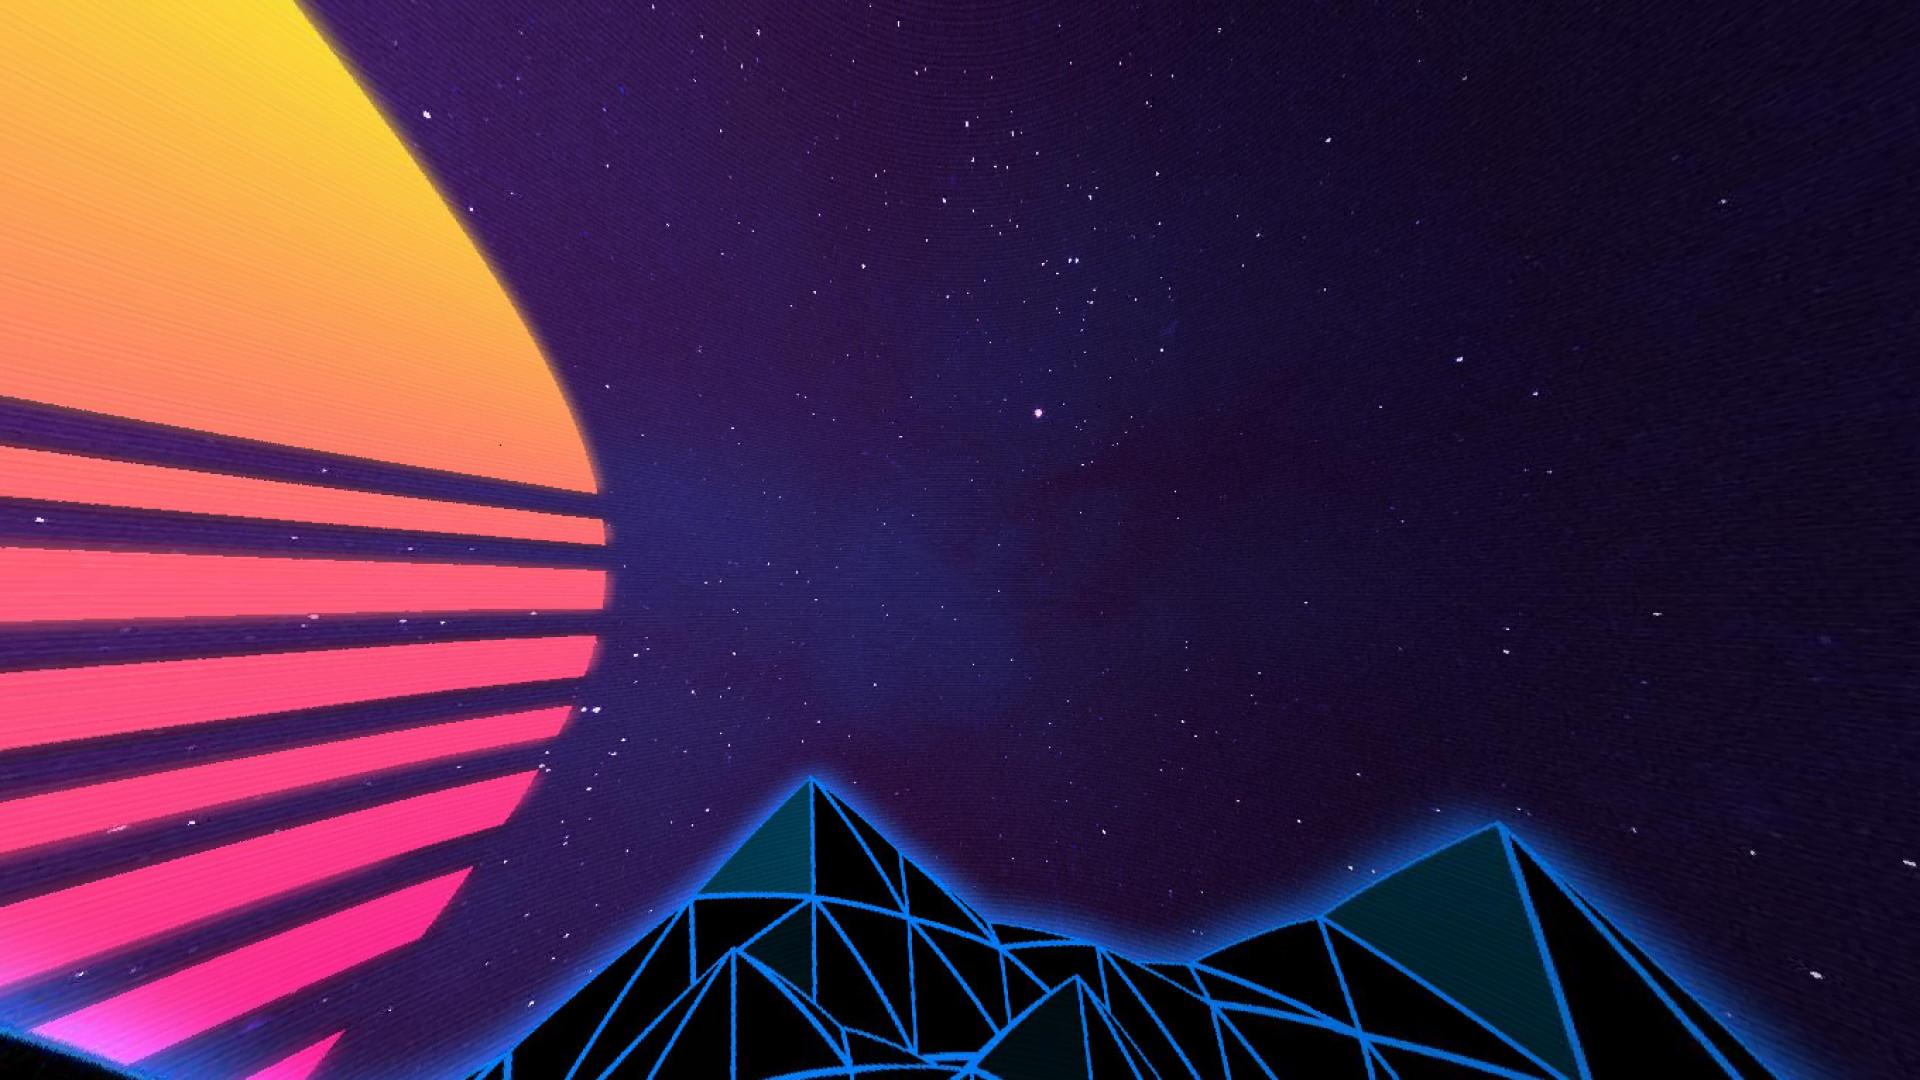 Neon Sky Overlay